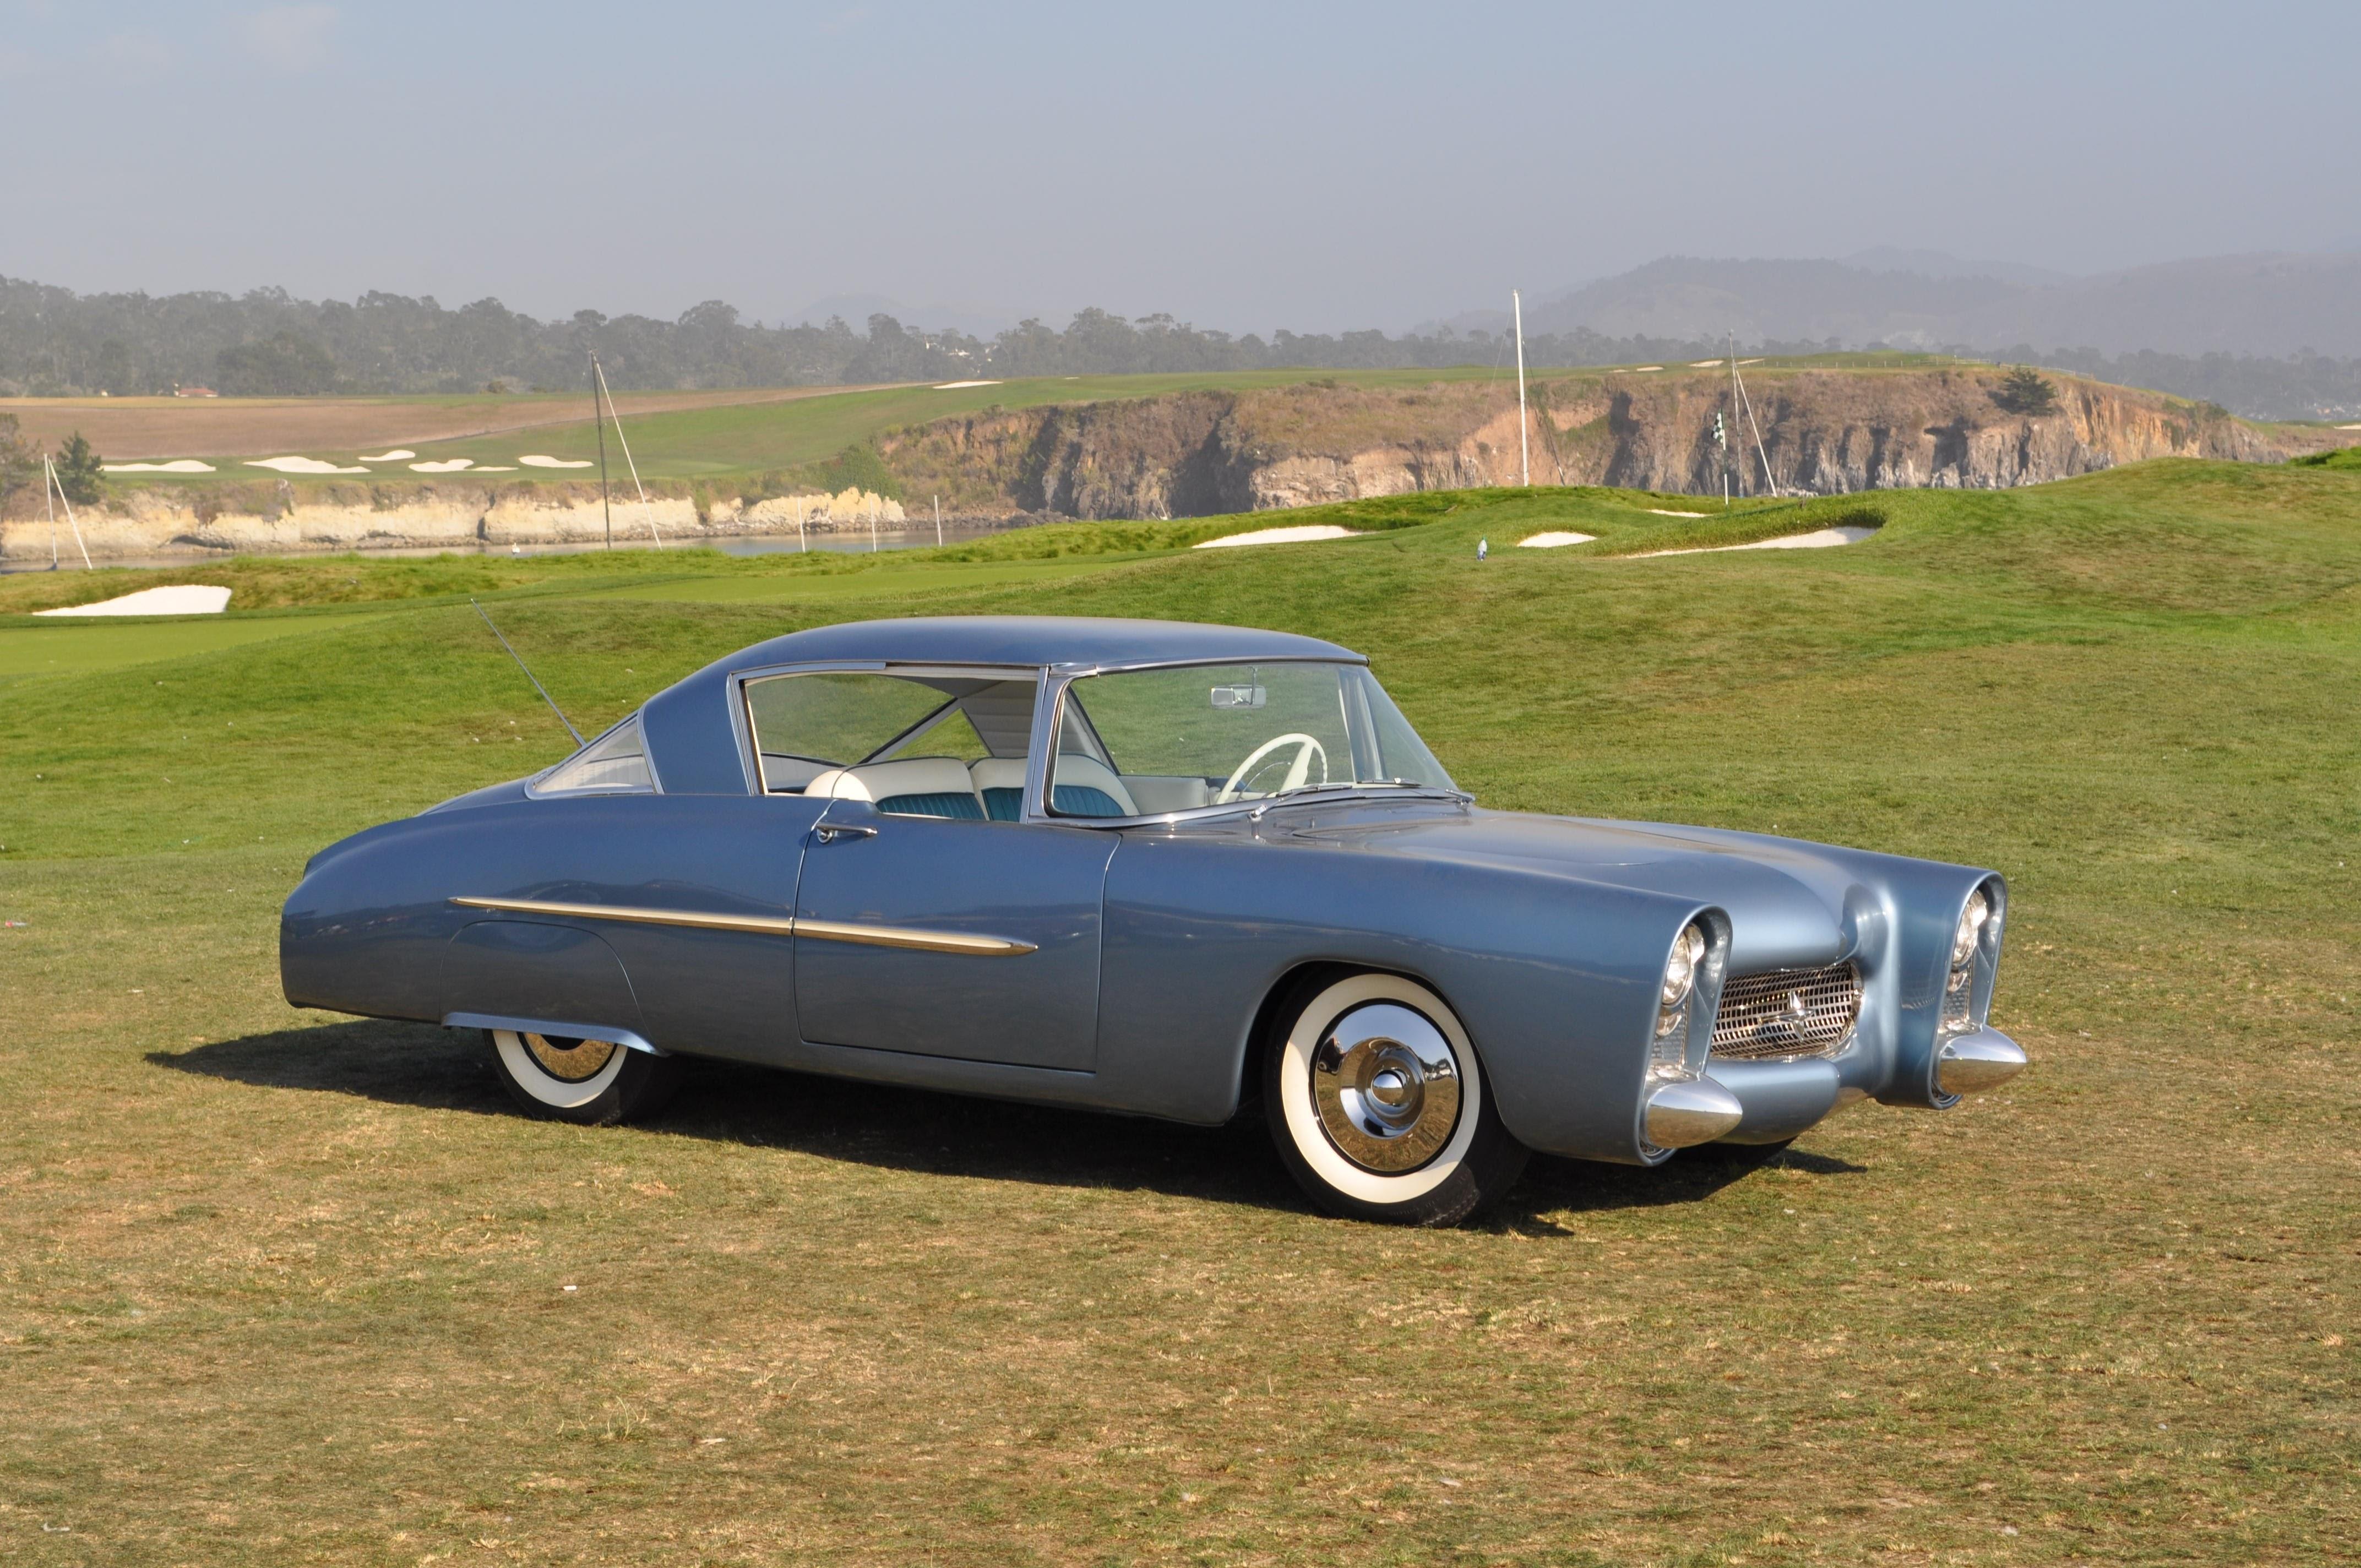 1950 mercury leo lyons custom hollywood wheels auction shows. Black Bedroom Furniture Sets. Home Design Ideas